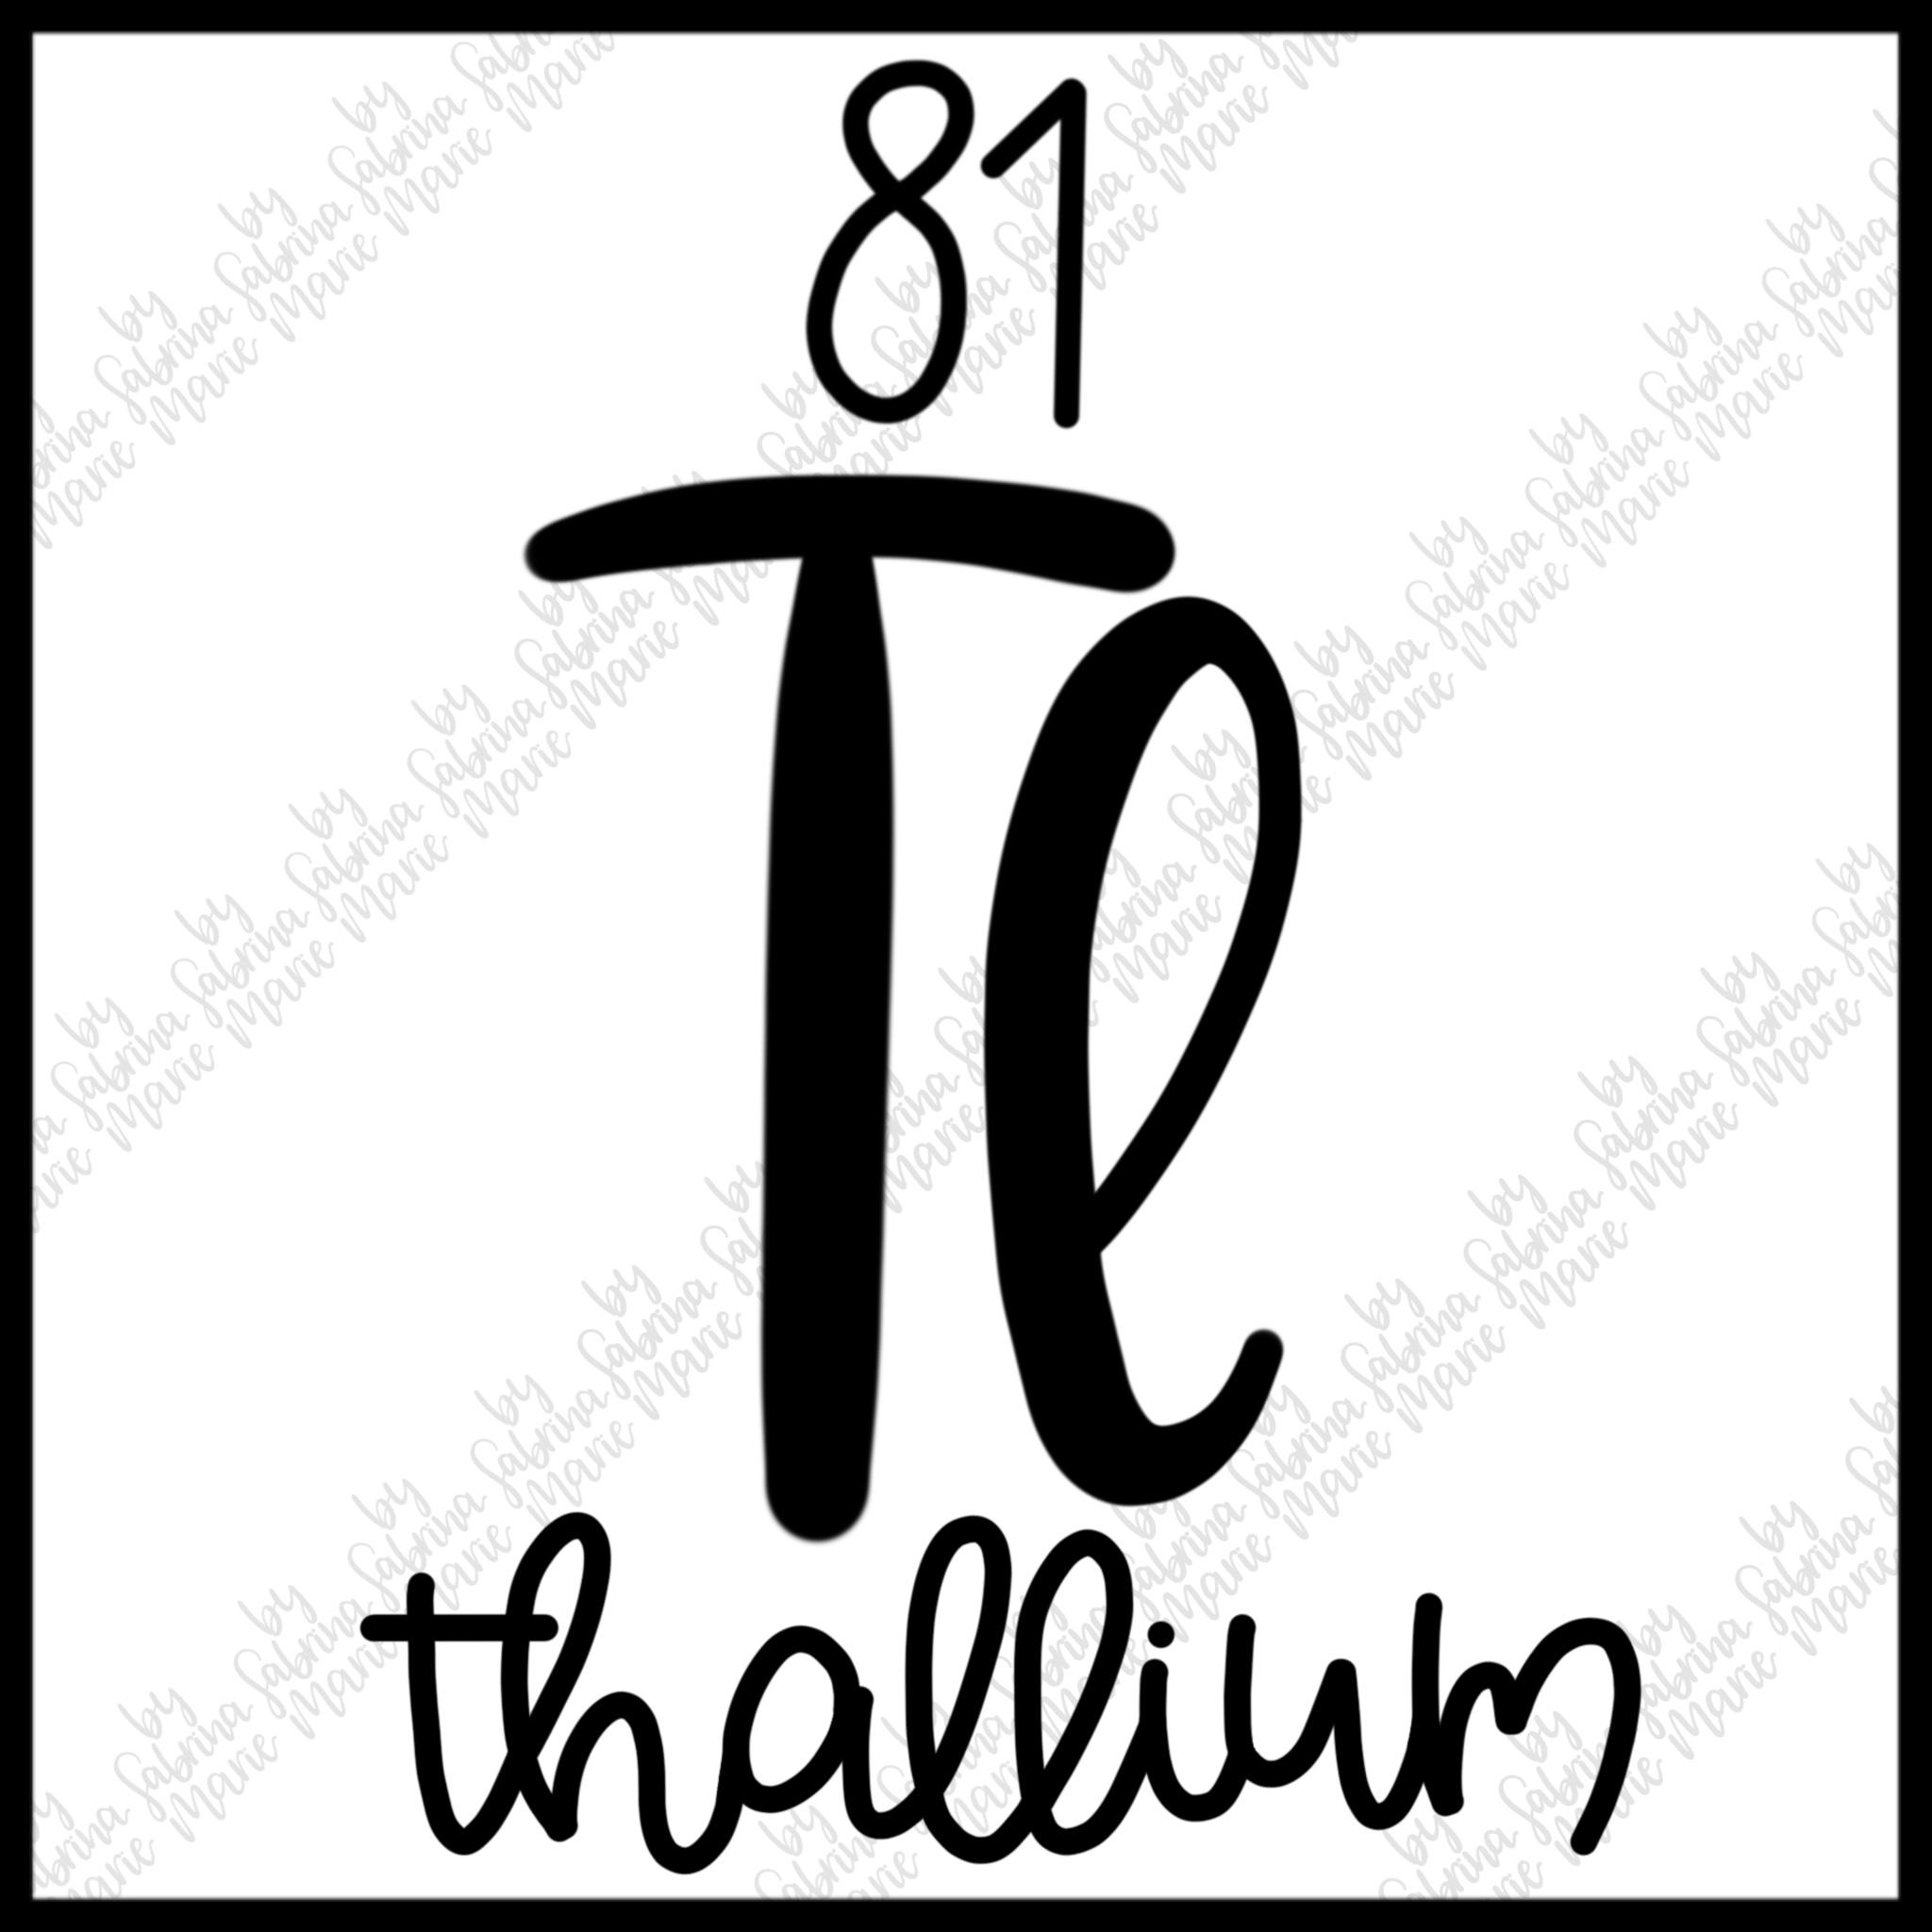 81 thallium handdrawn periodic table element svg Dy Symbol 81 thallium handdrawn periodic table element svg ex le image 2